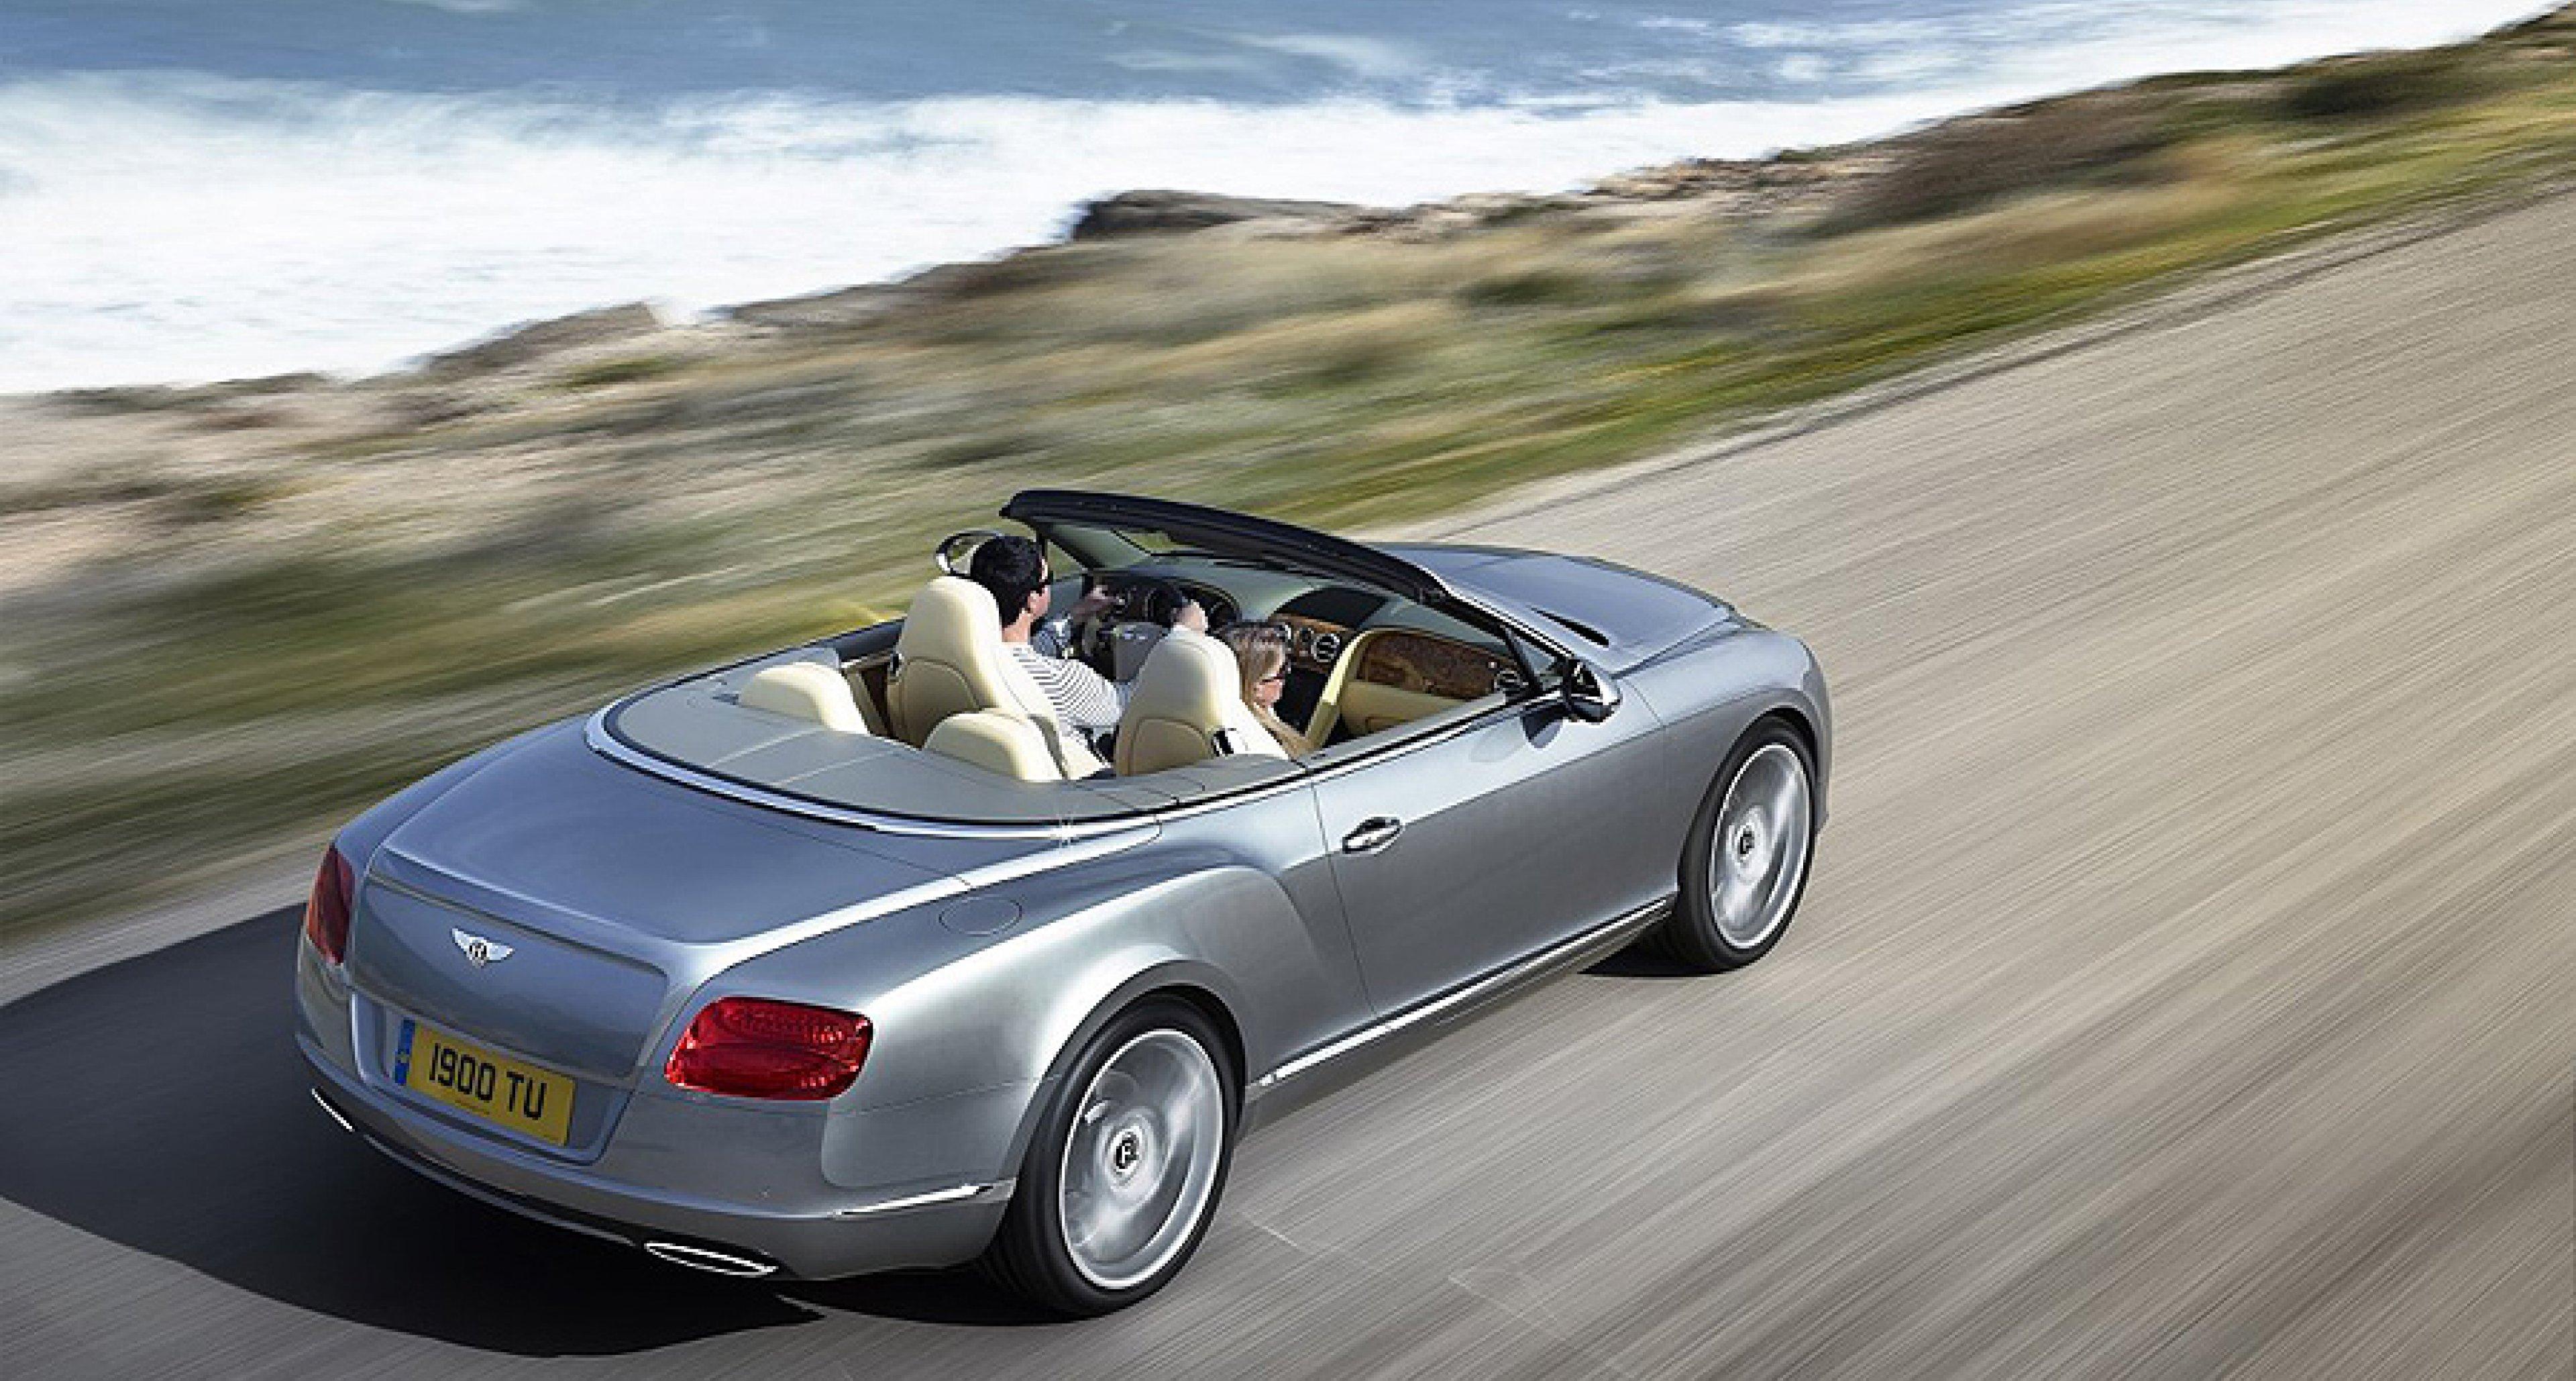 New Bentley Continental GTC to debut at Frankfurt